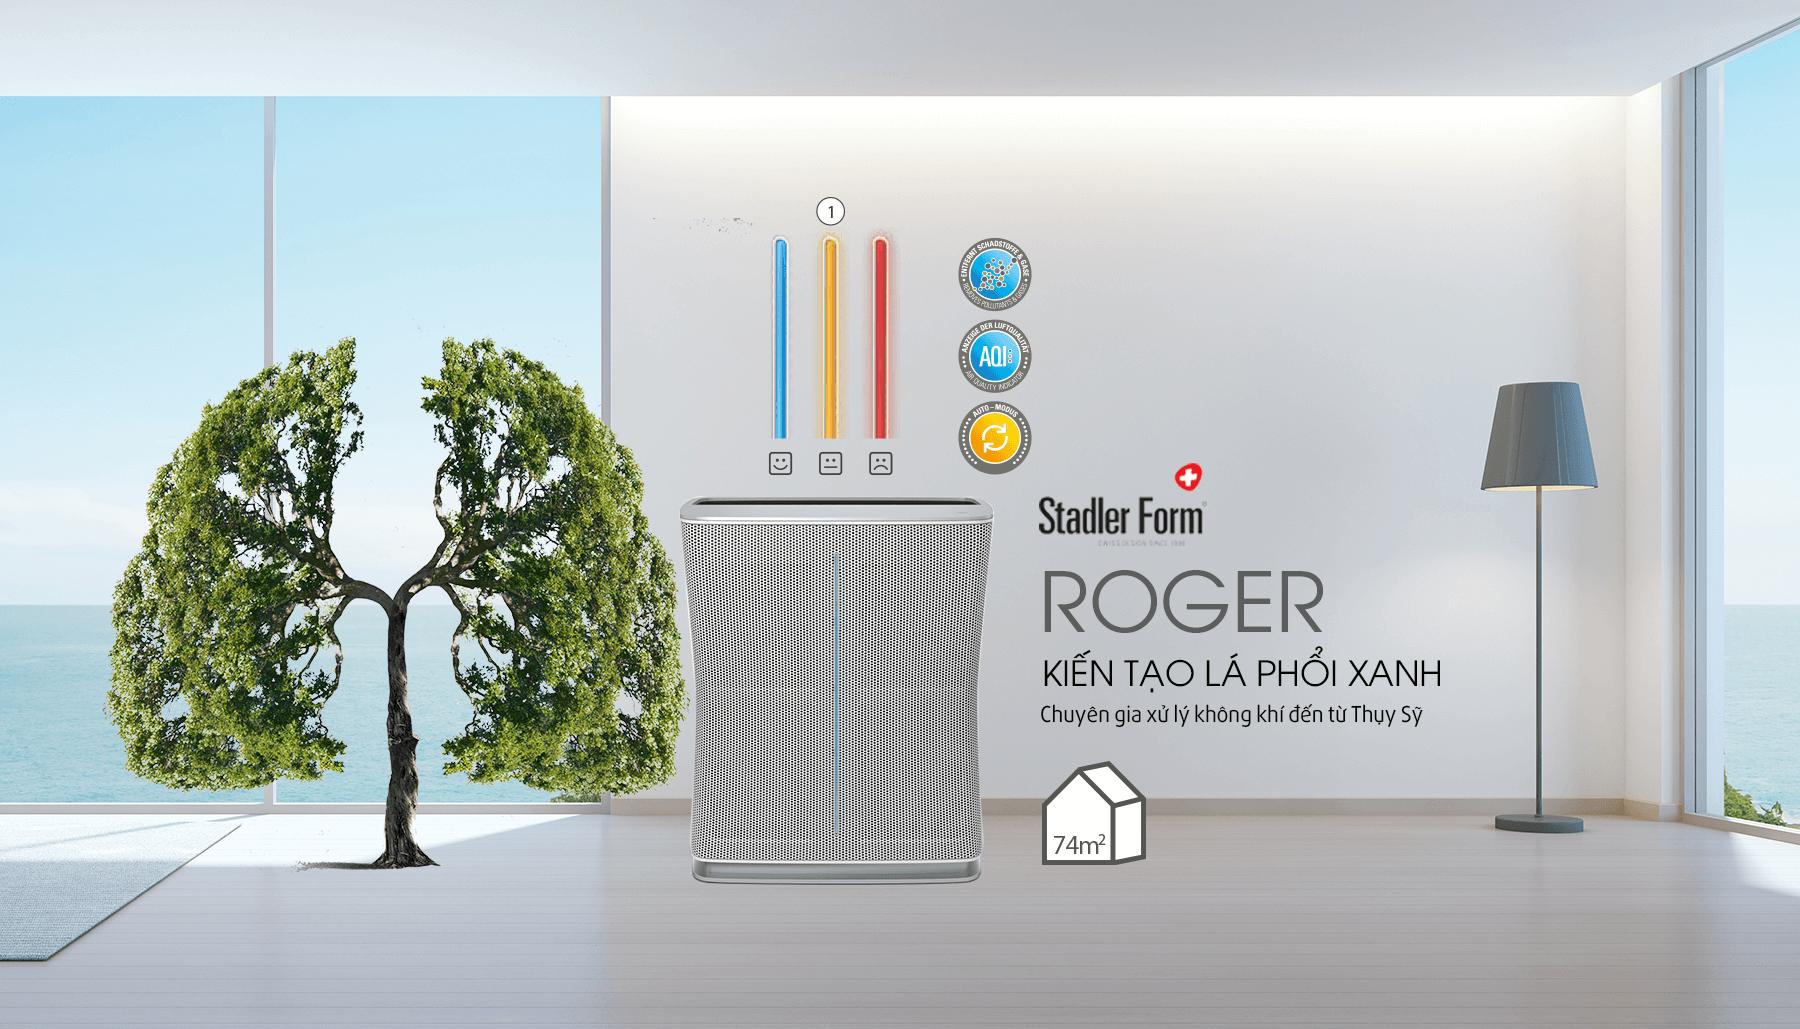 Stadler Form Roger